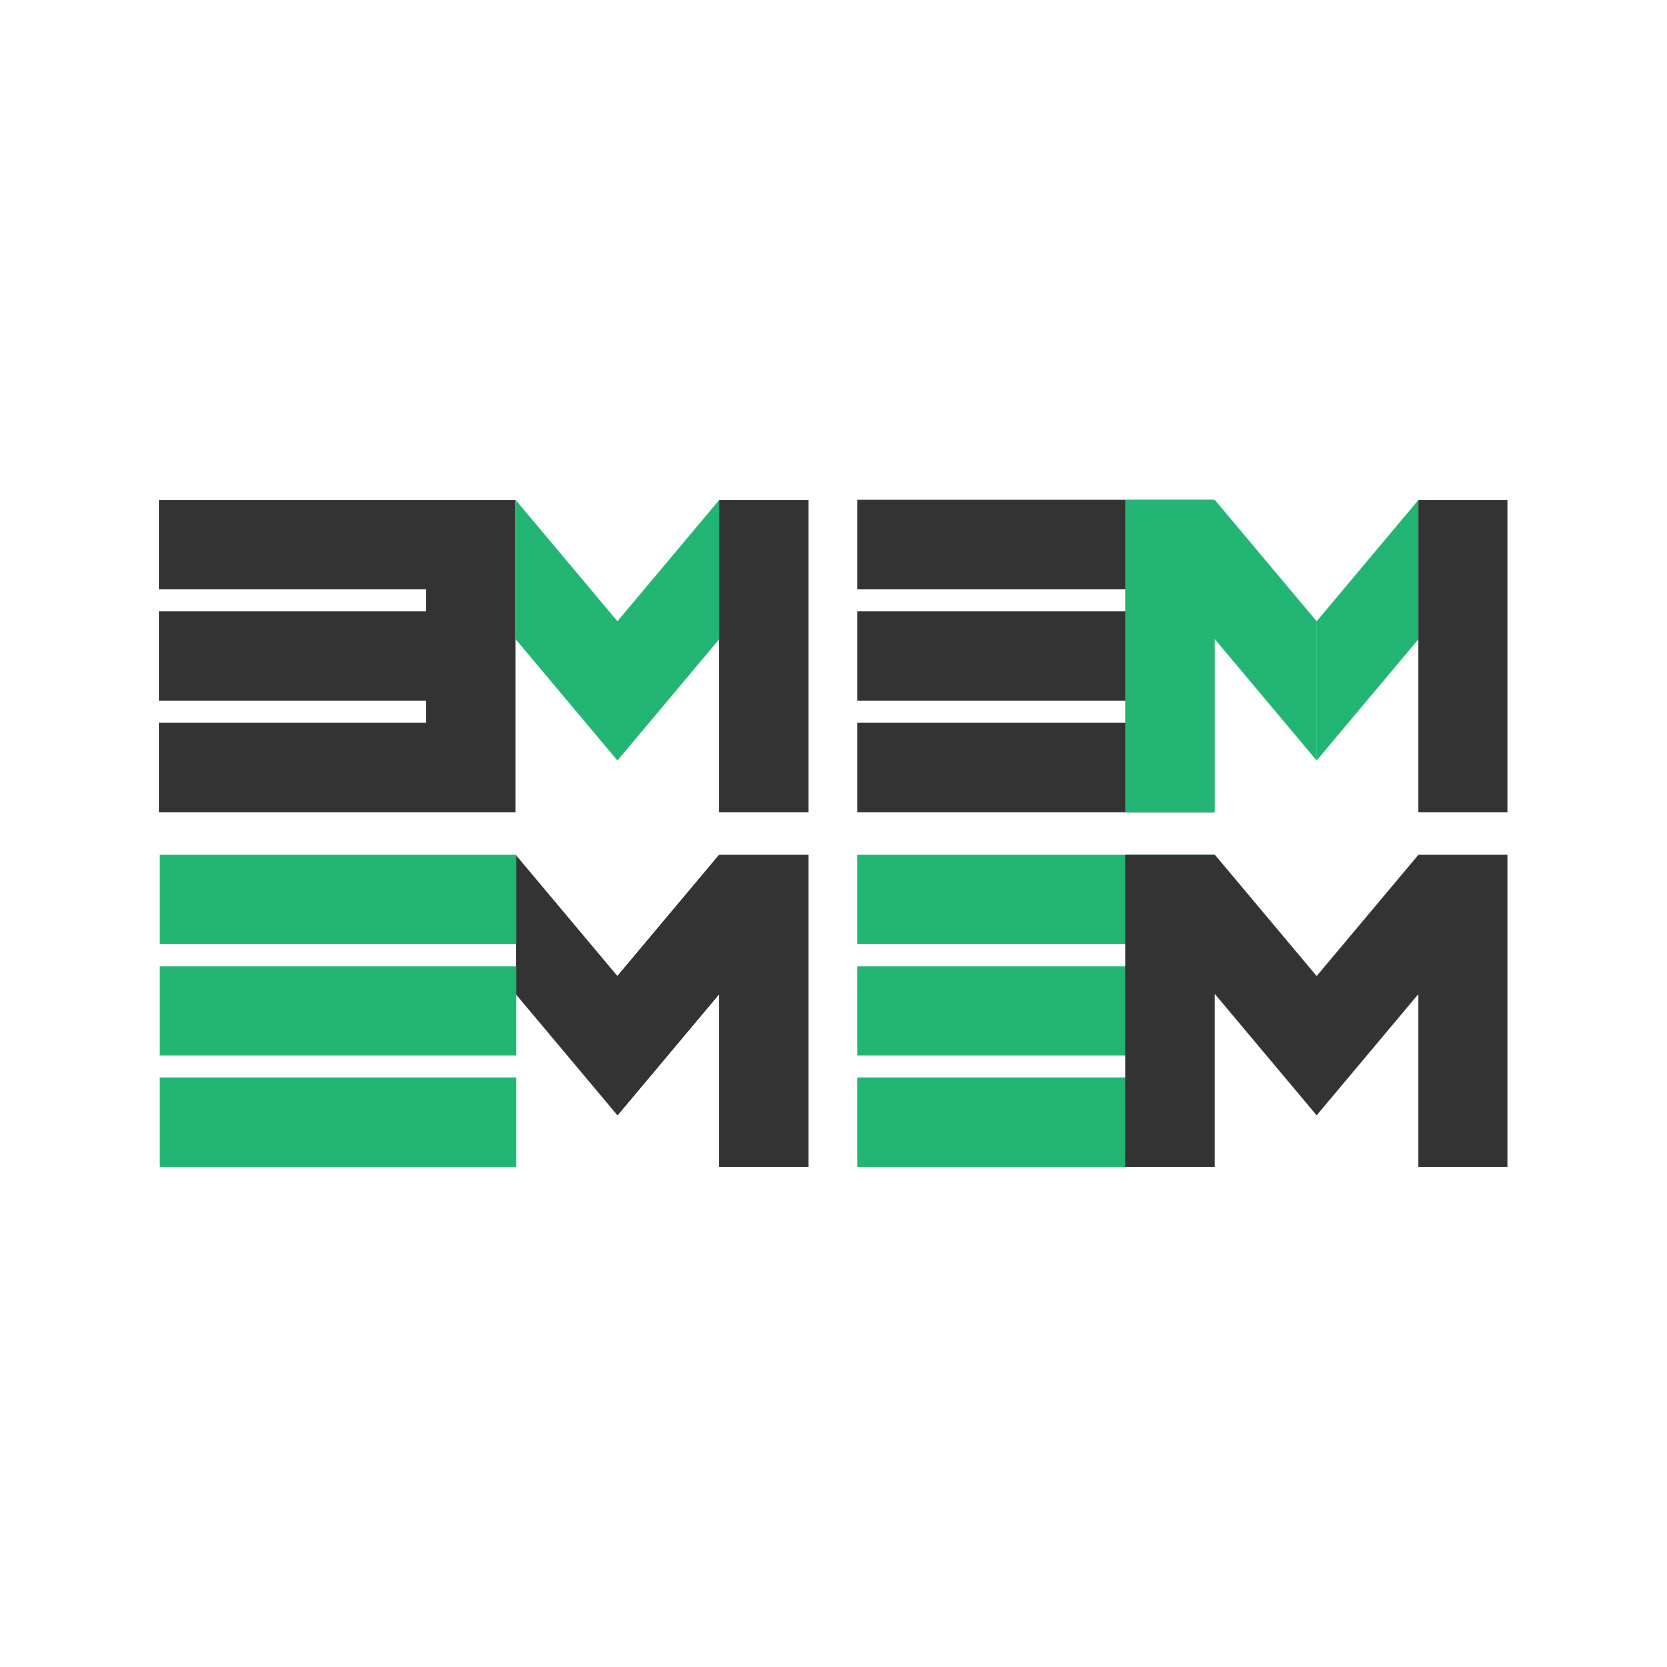 Логотип и фирменный стиль для магазина тканей. фото f_5725cd6d894f31f0.jpg